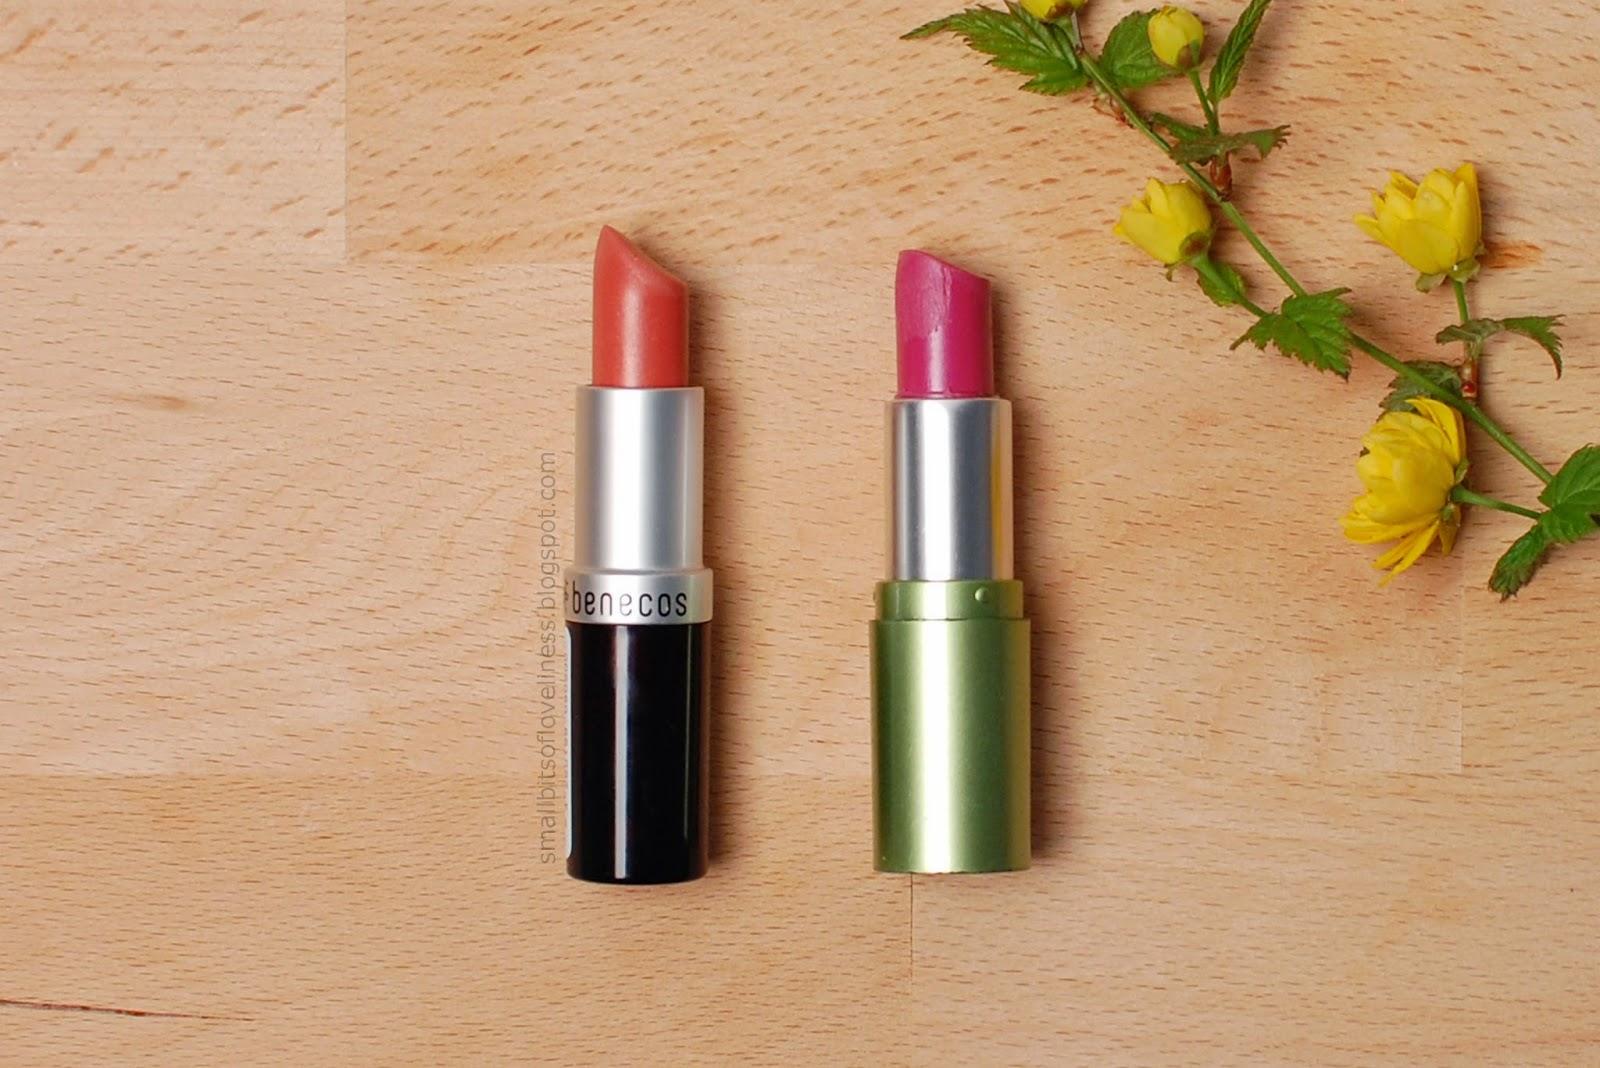 Benecos Peach, Alverde Nadja lipstick